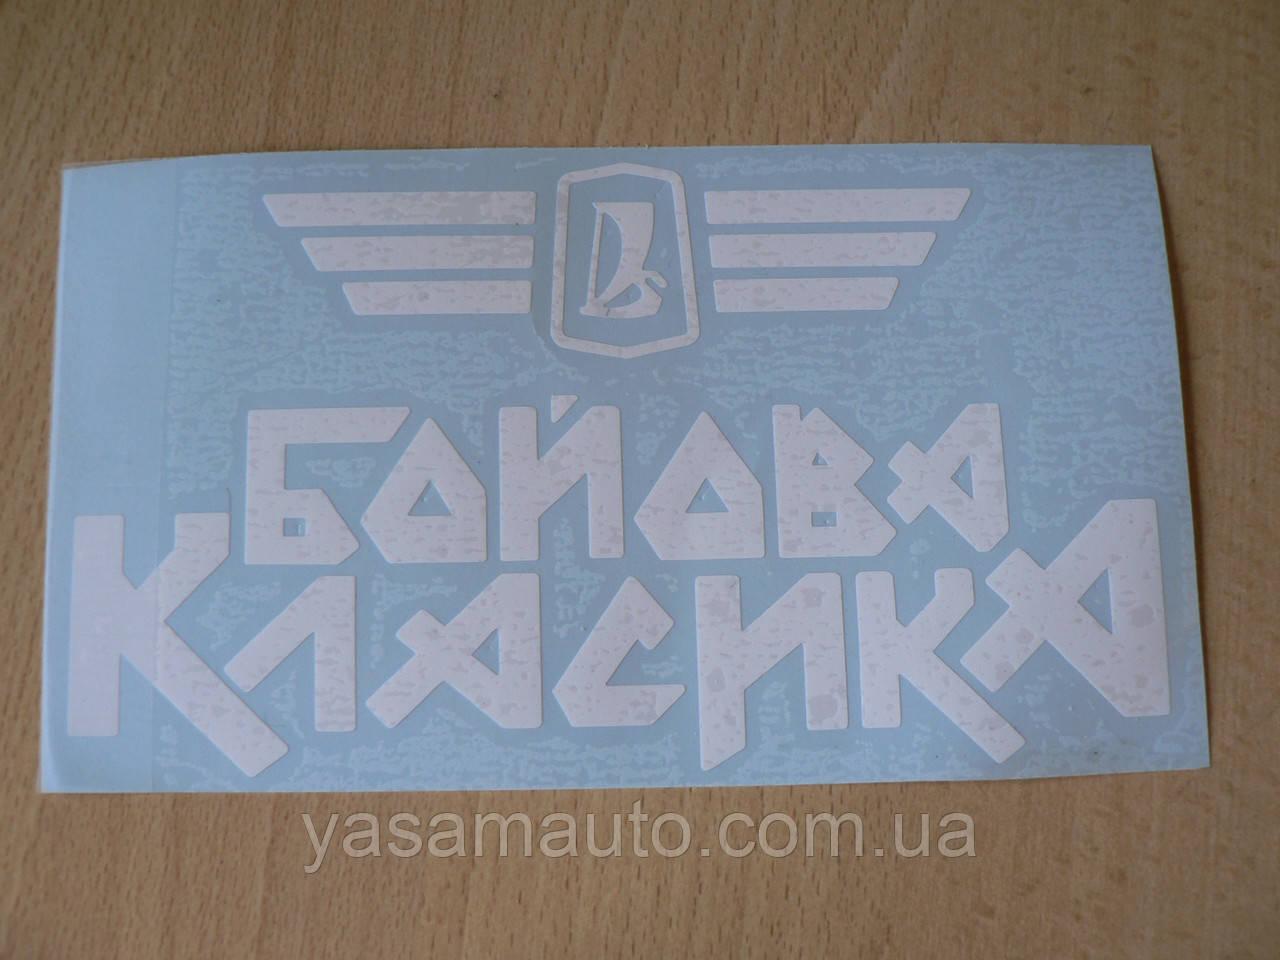 Наклейка vc ВАЗ Бойова класика 184х107мм белая виниловая контурная эмблема на авто Лада Lada